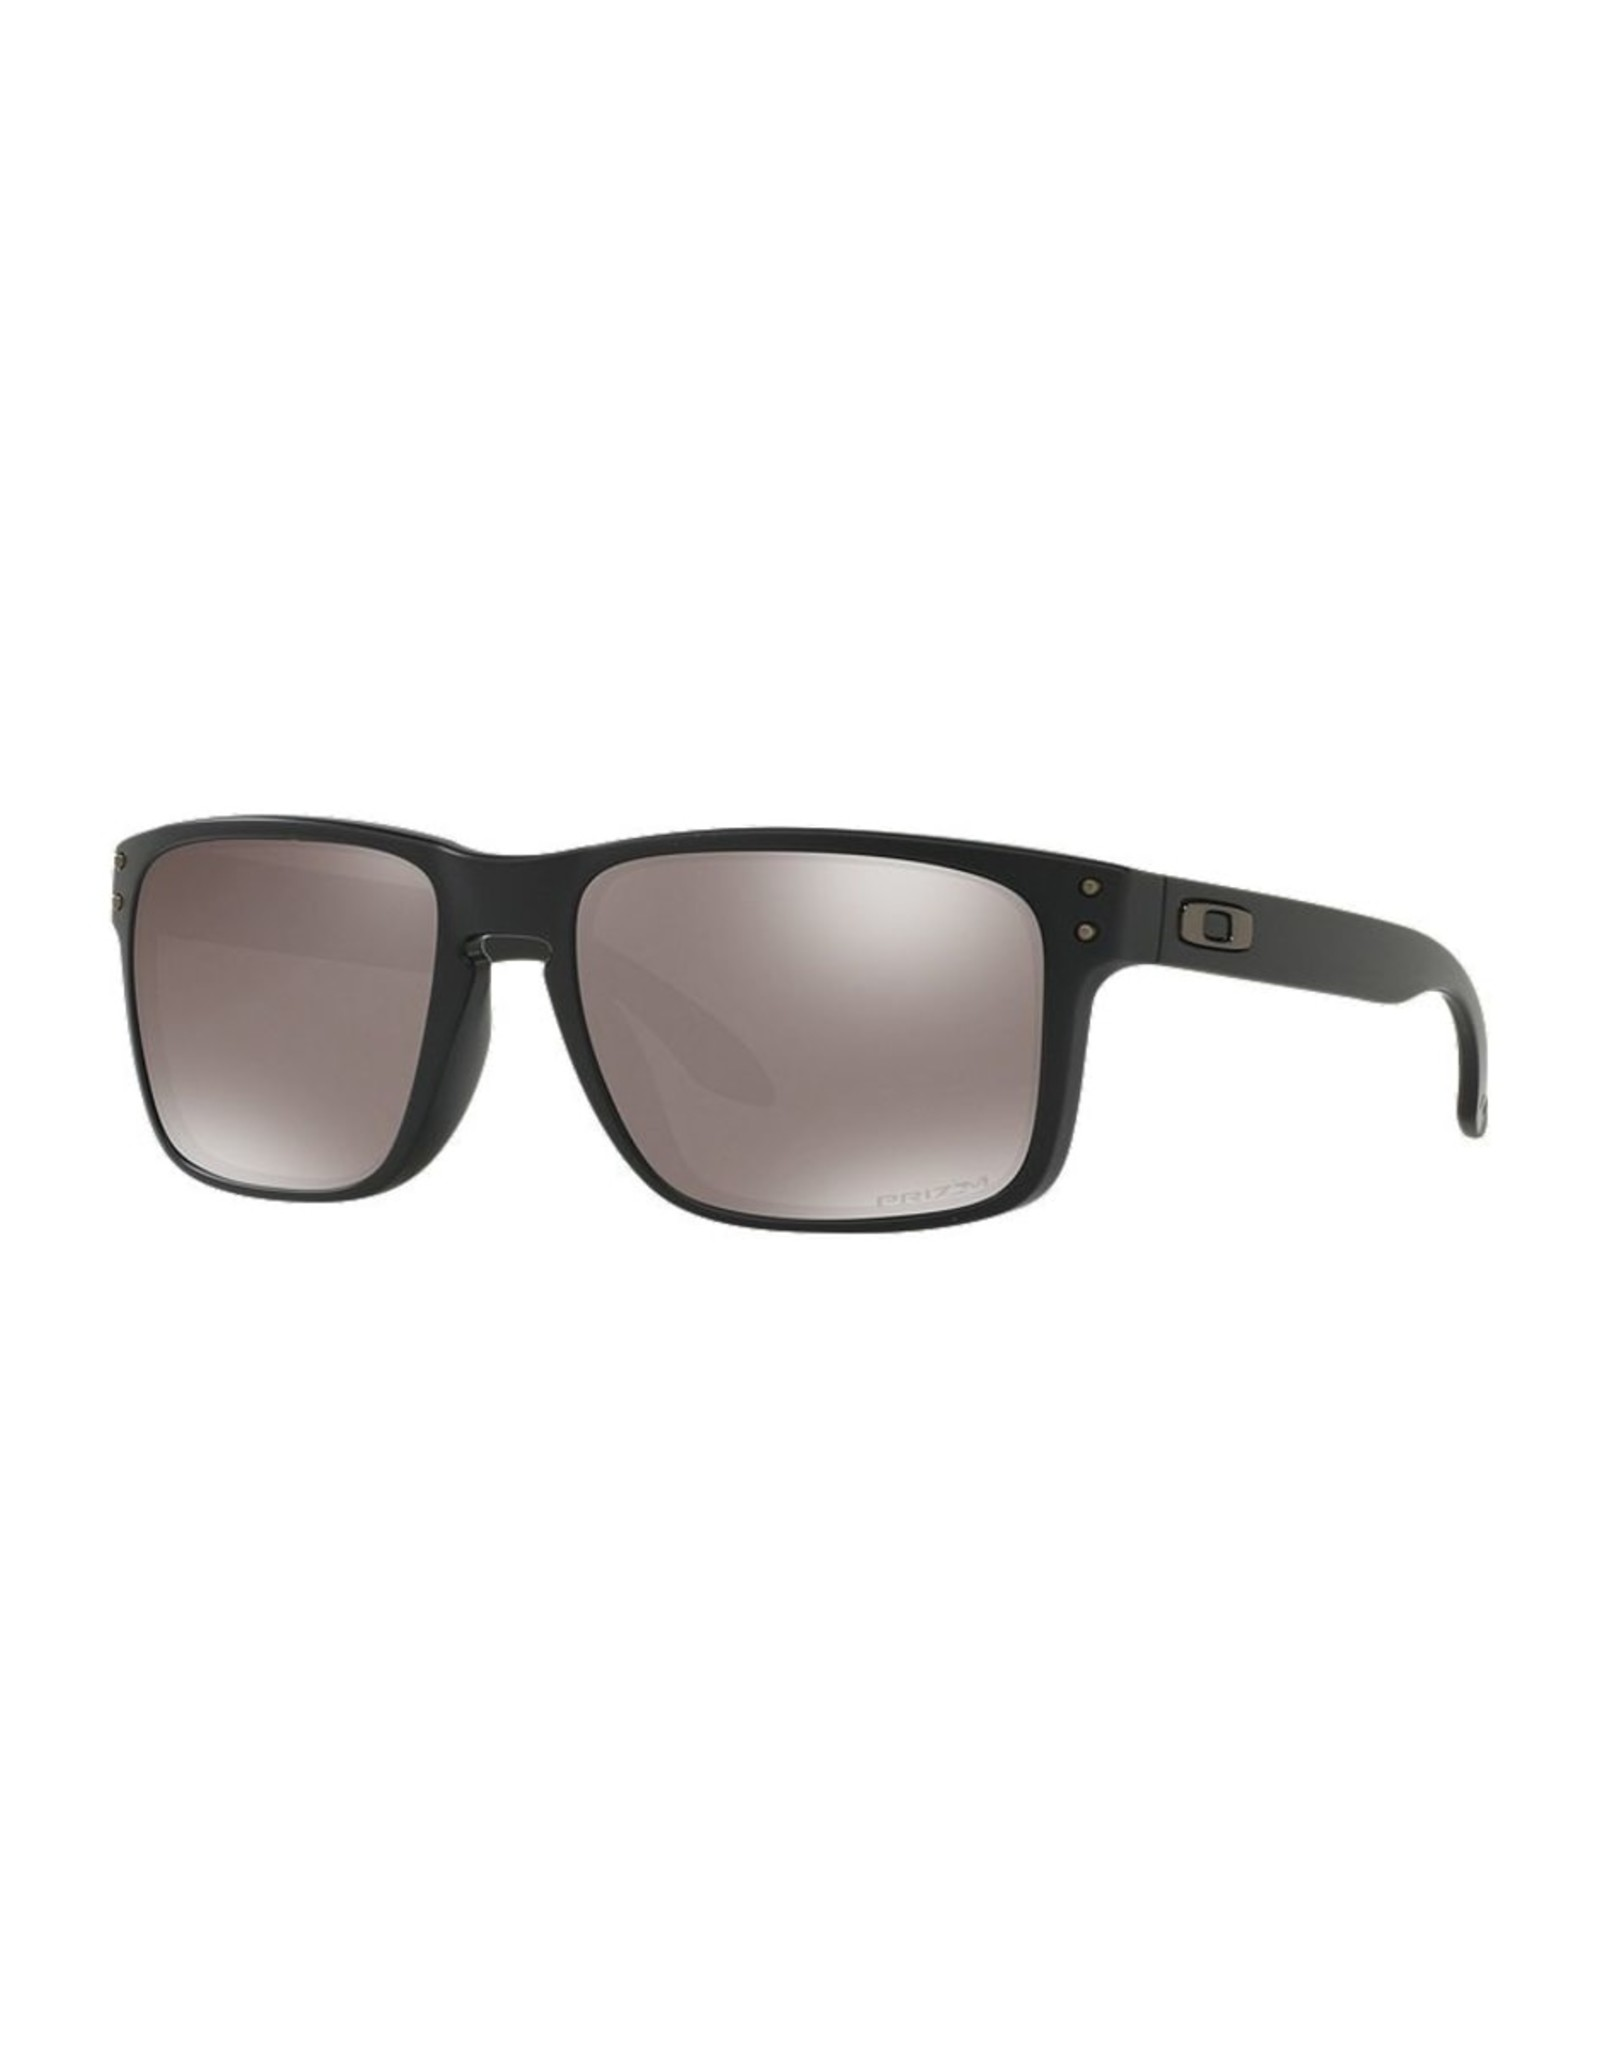 Oakley Mens sunglasses Holbrook XL matte black w/ prizm grey